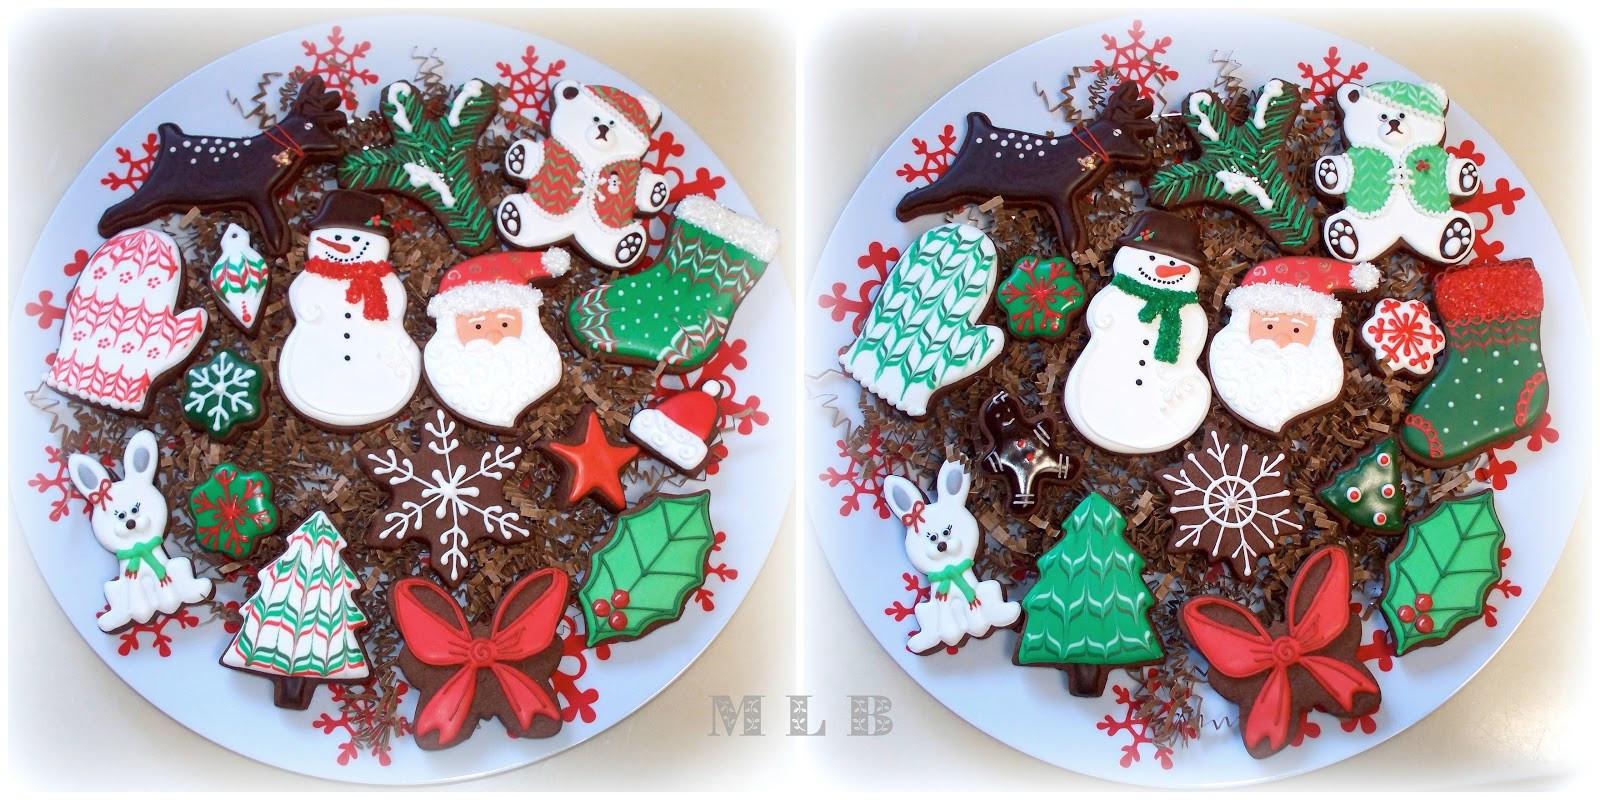 Bakery Christmas Cookies  My little bakery 🌹 Christmas cookies